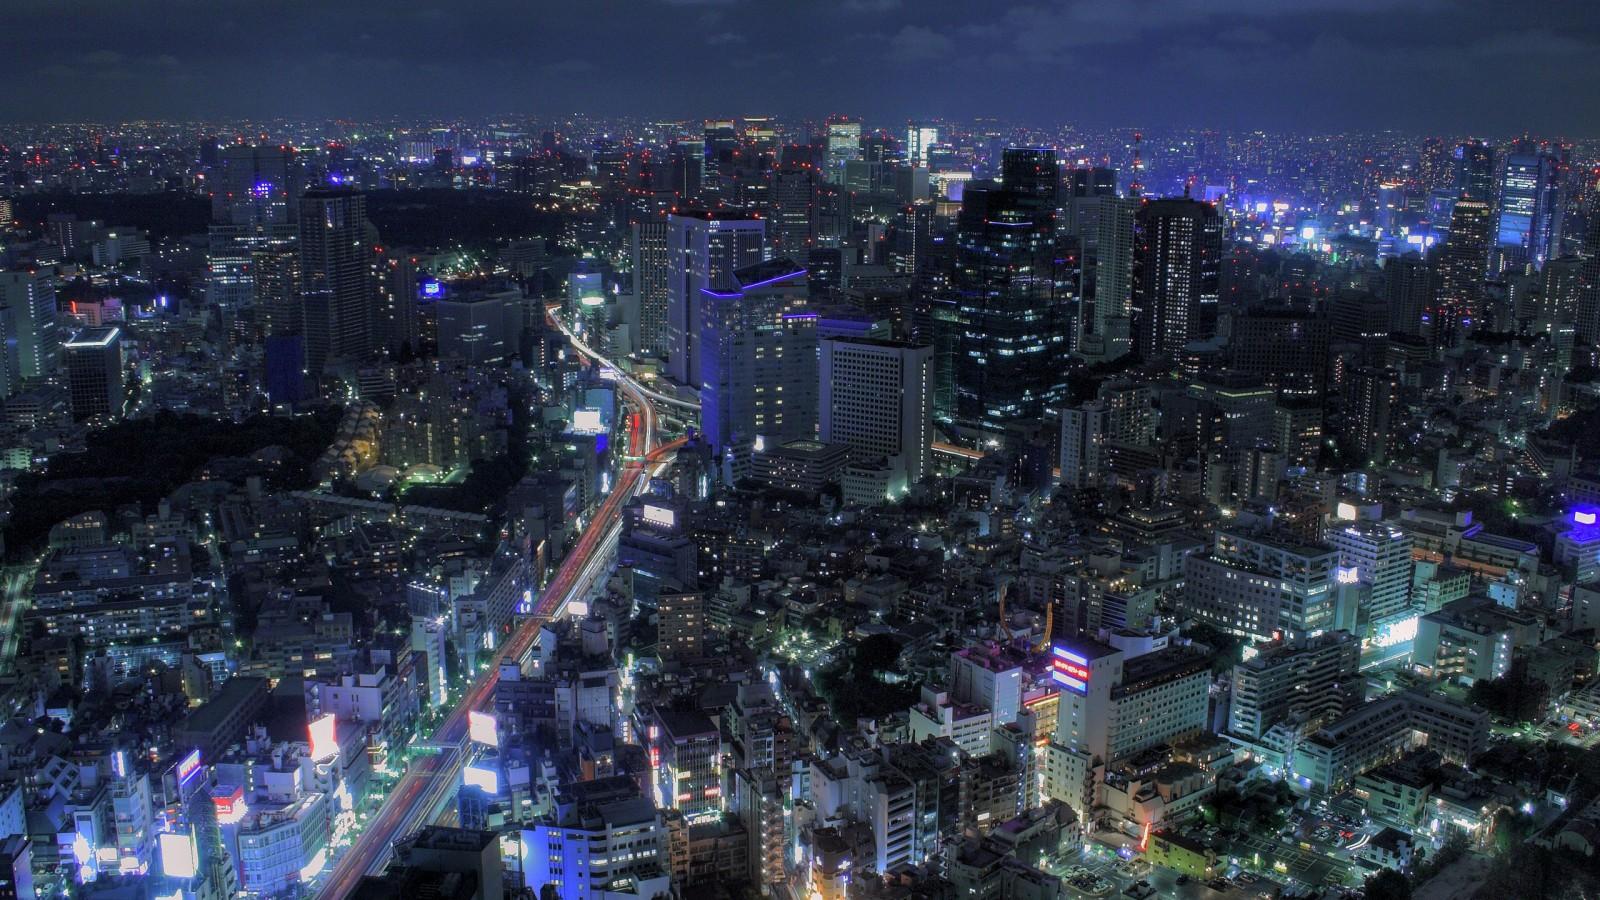 Night In Tokyo Wallpaper HD 14200 Wallpaper Wallpaper hd 1600x900